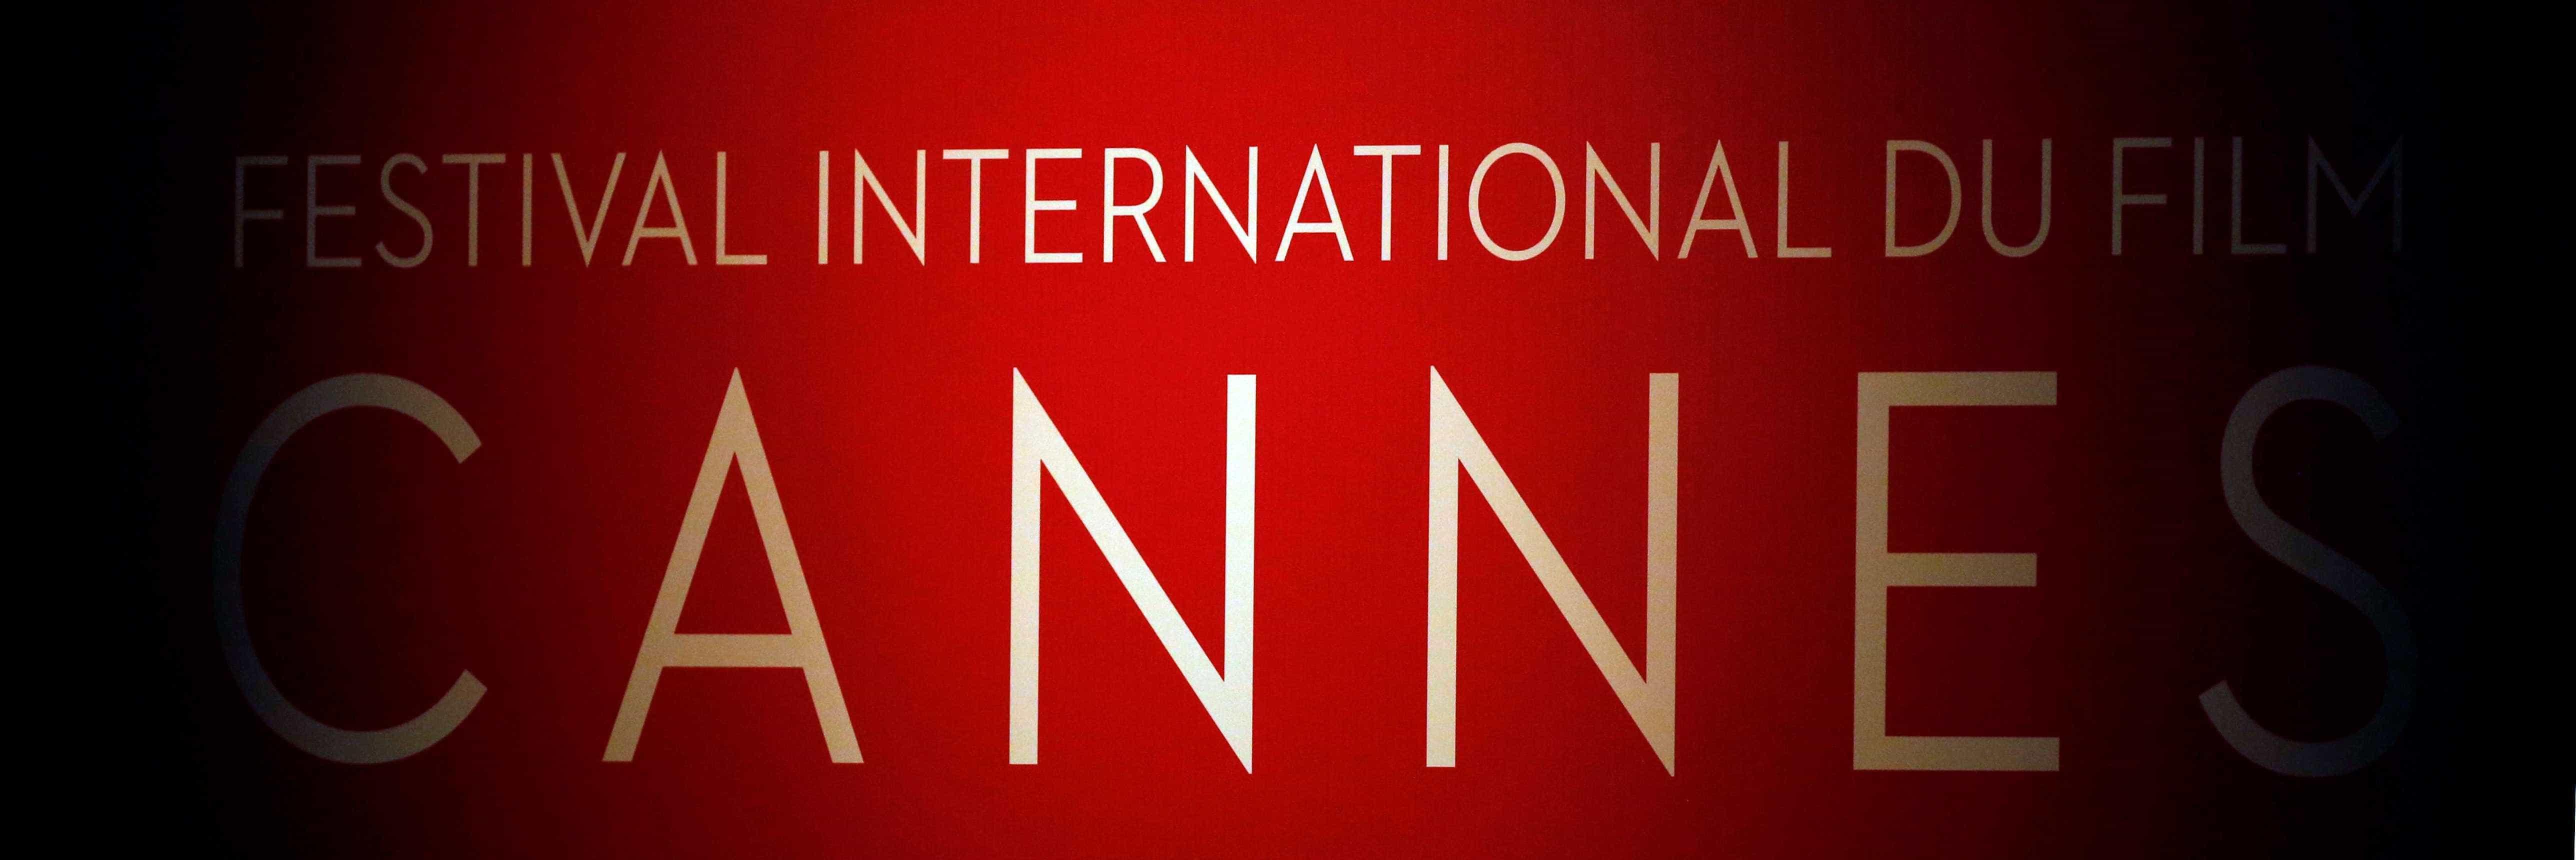 Realizadora Nadine Labaki preside júri do 'Un Certain Regard' em Cannes